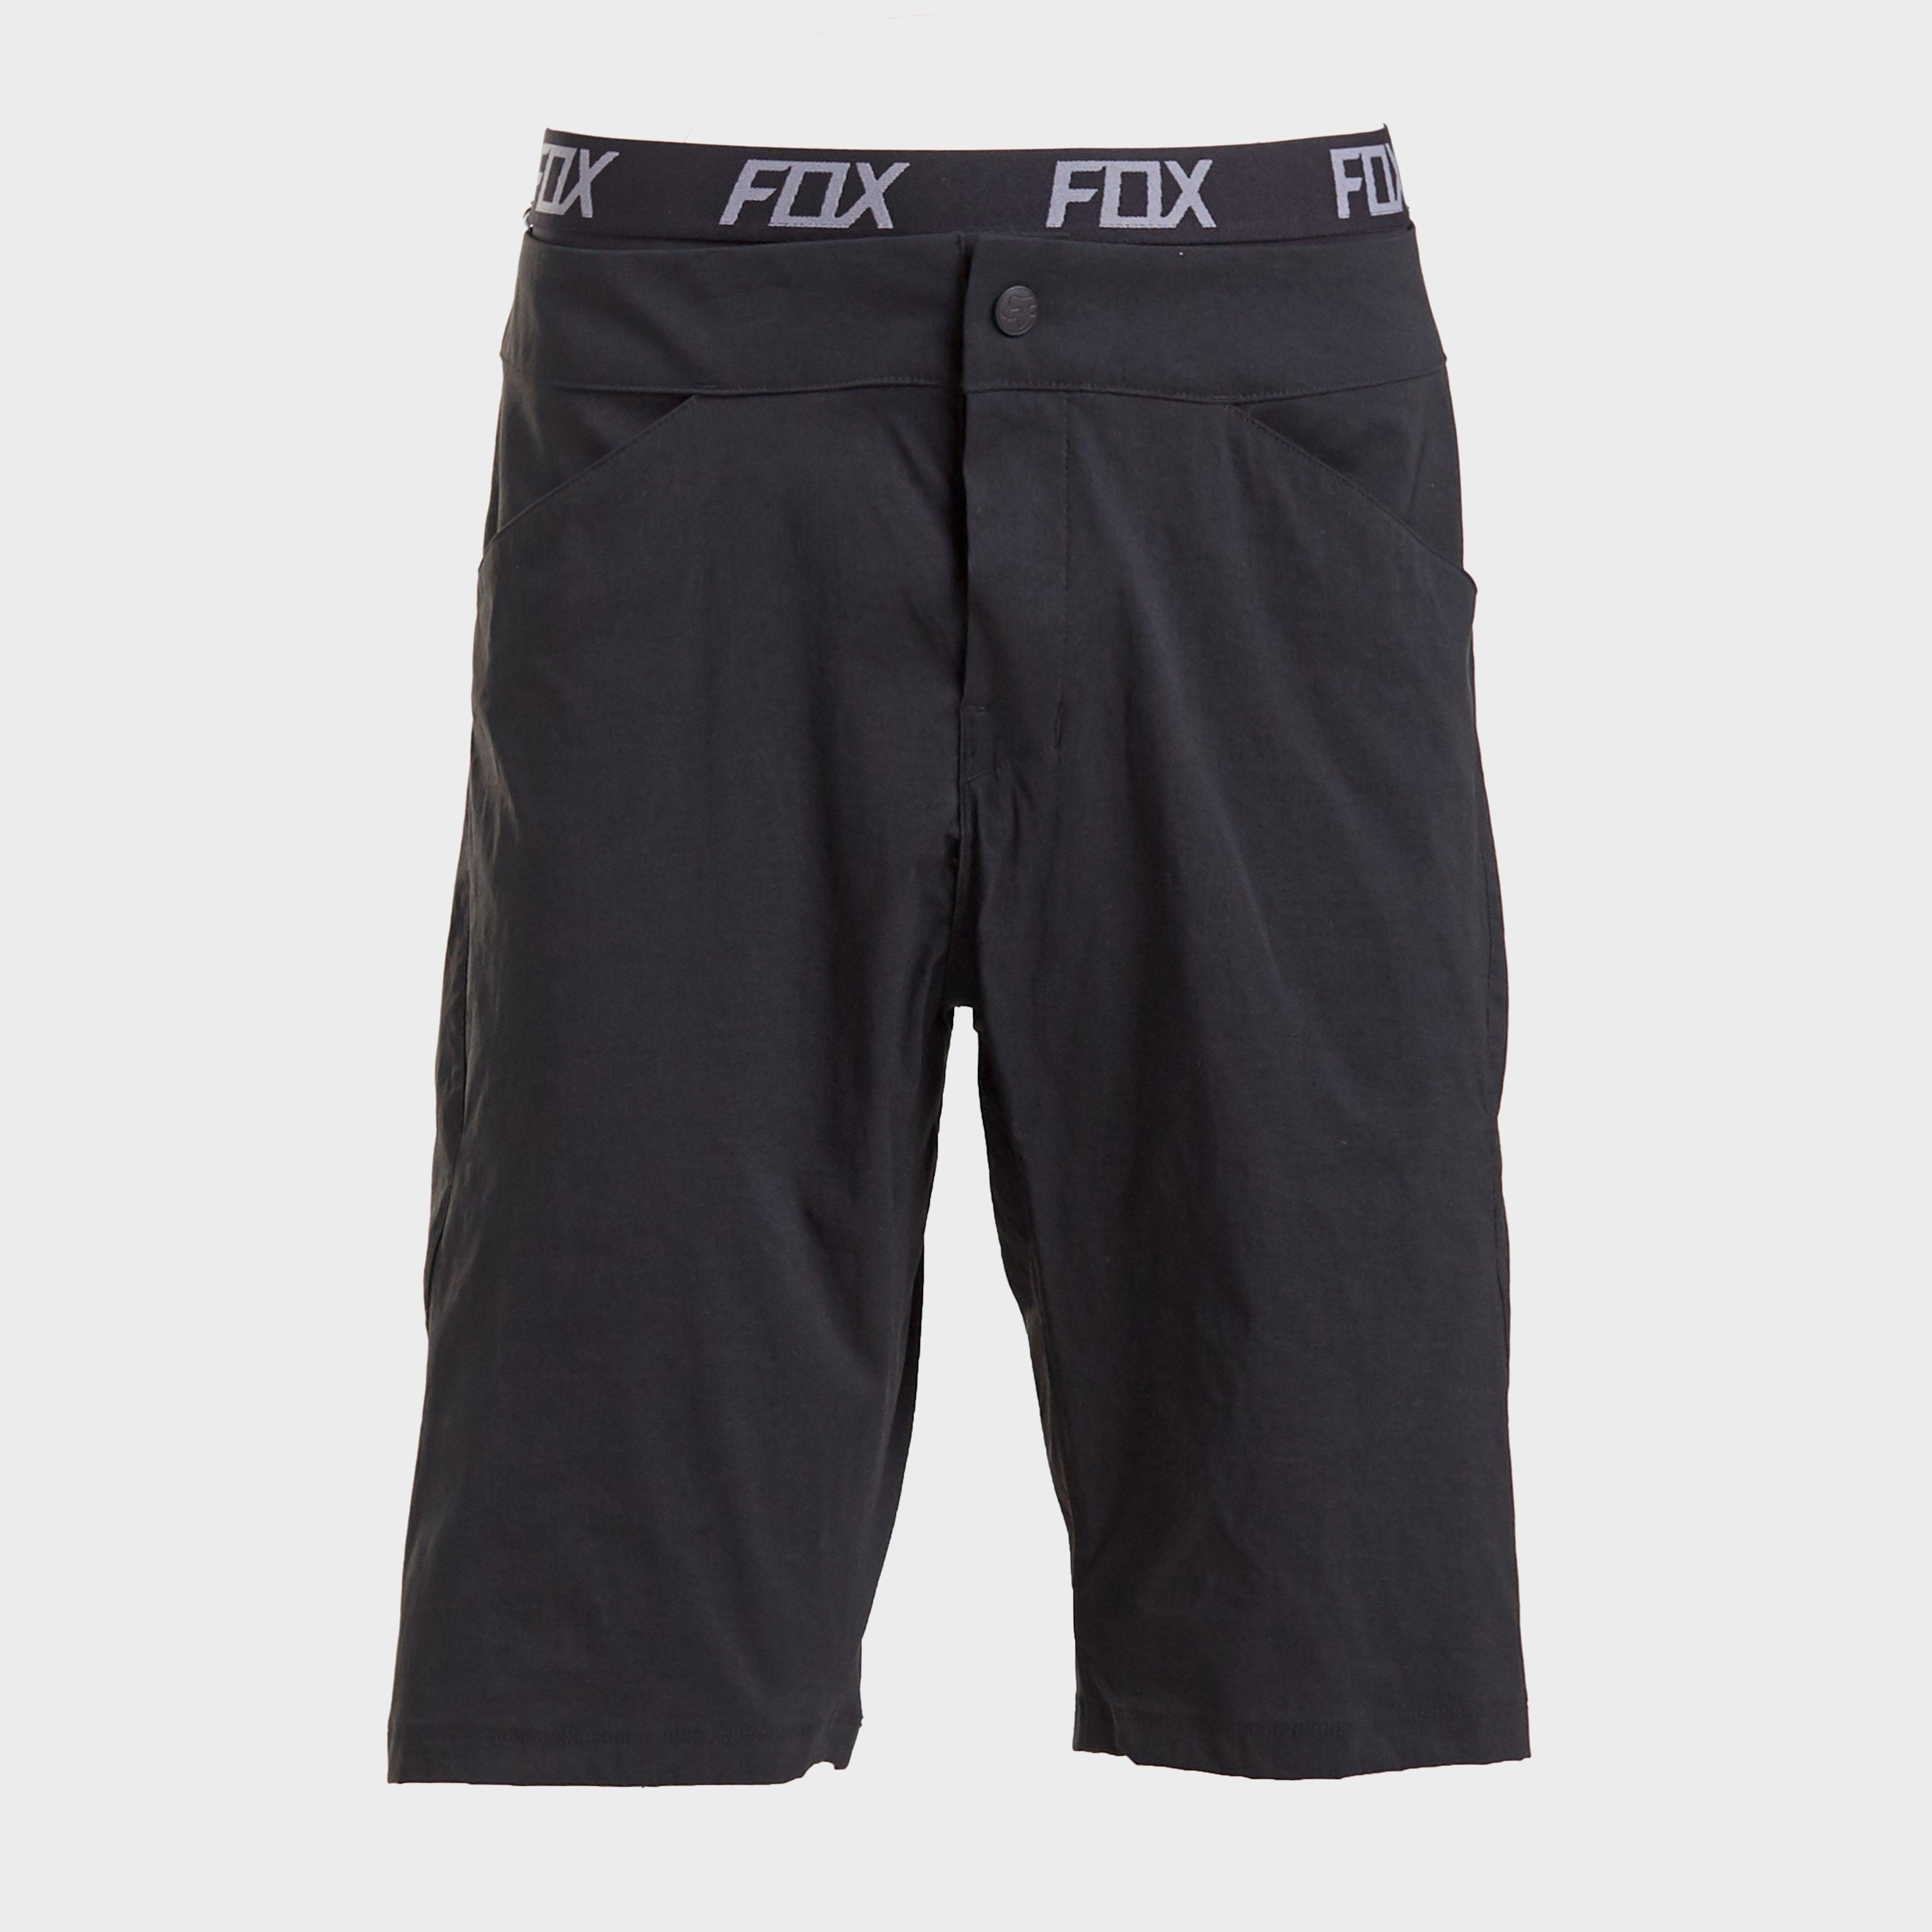 FOX Fox Mens Ranger Lite Shorts, Black